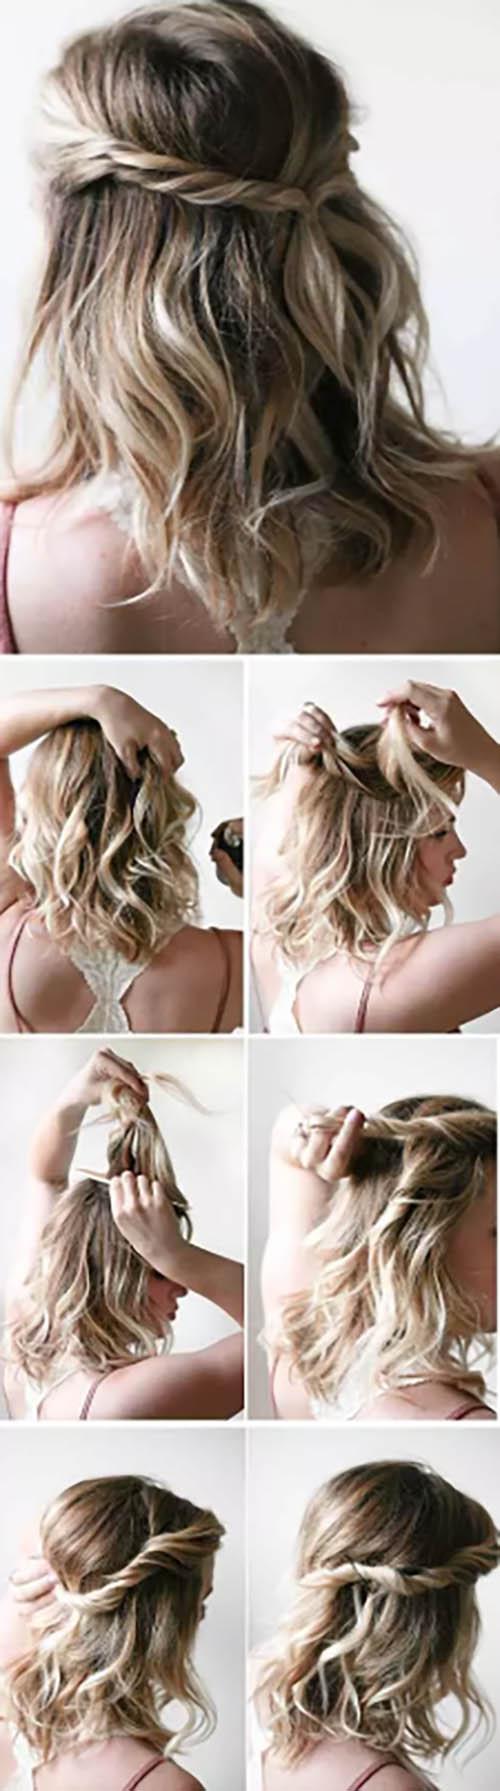 Kiểu tóc quấn đơn giản